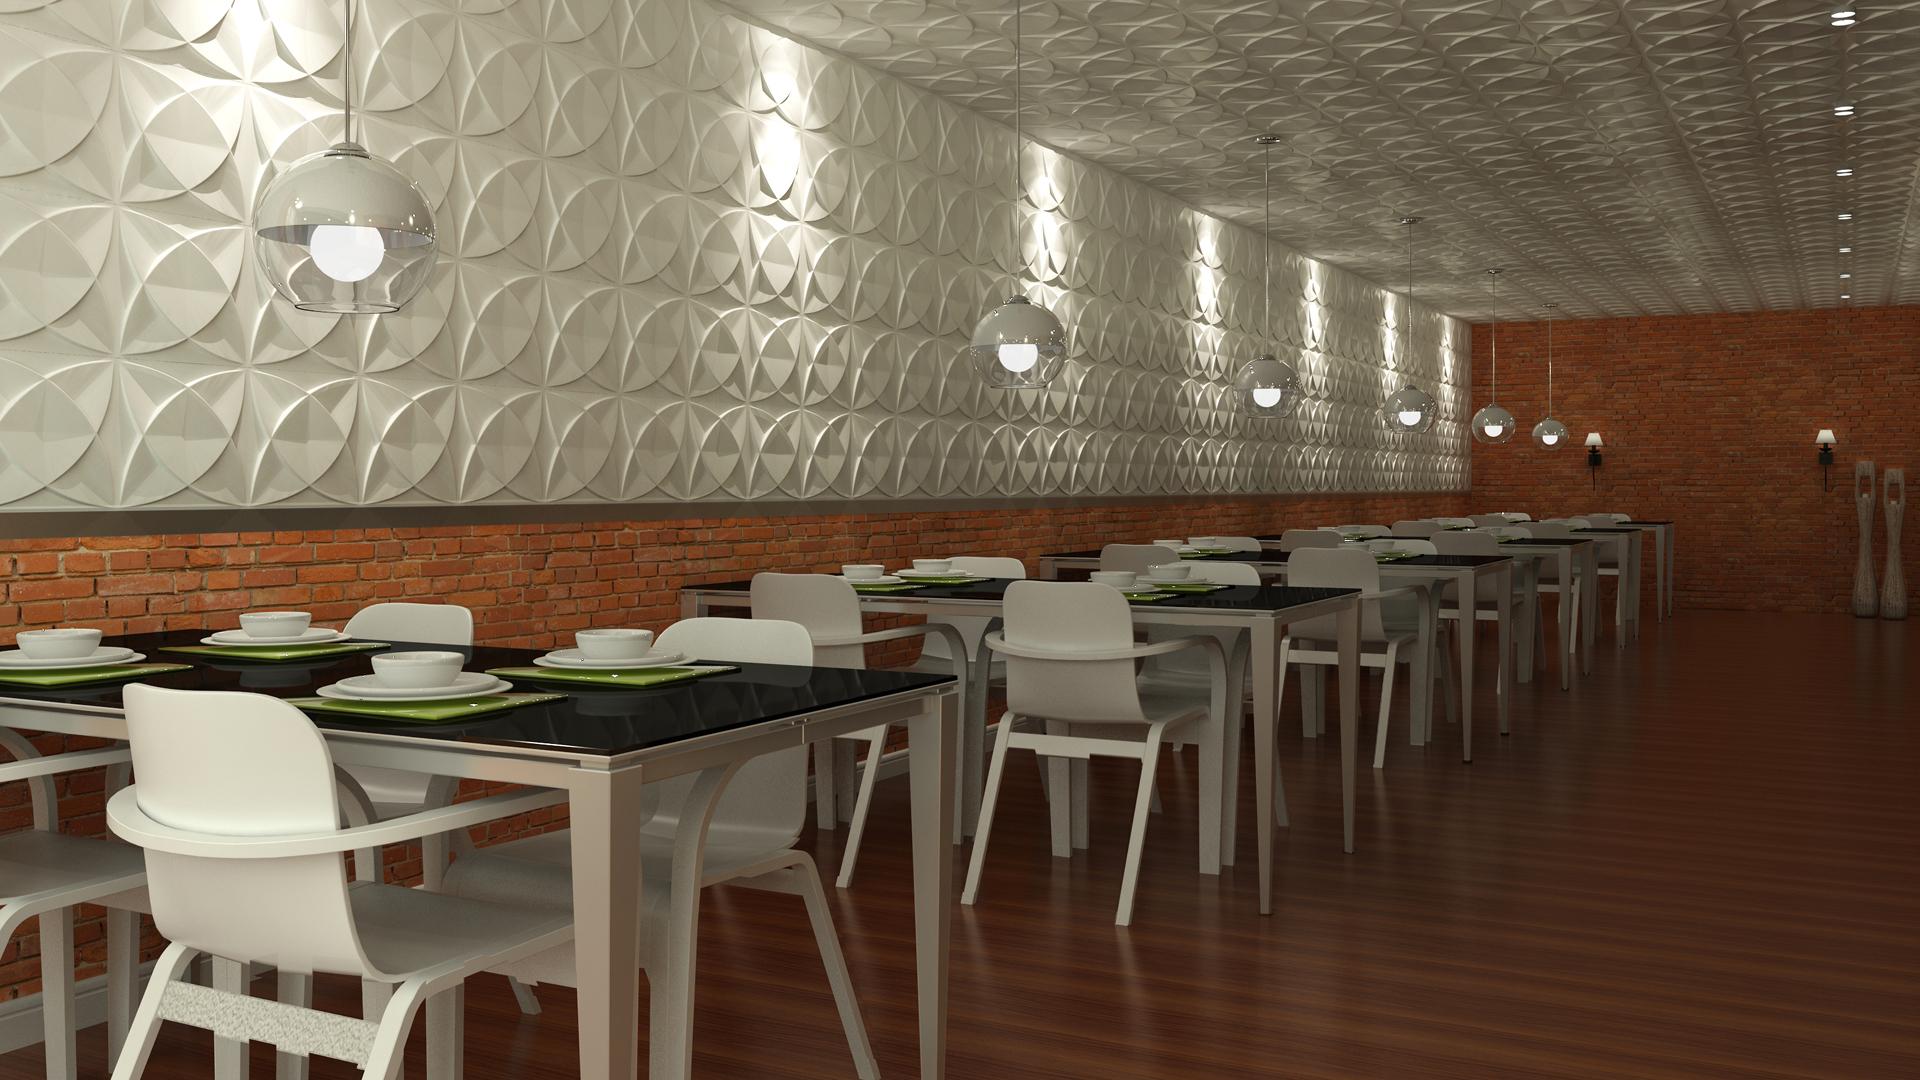 3D Wandpaneele - Produkte - Cosmos - Deckenpaneele - 3D Tapeten - Wandverkleidung